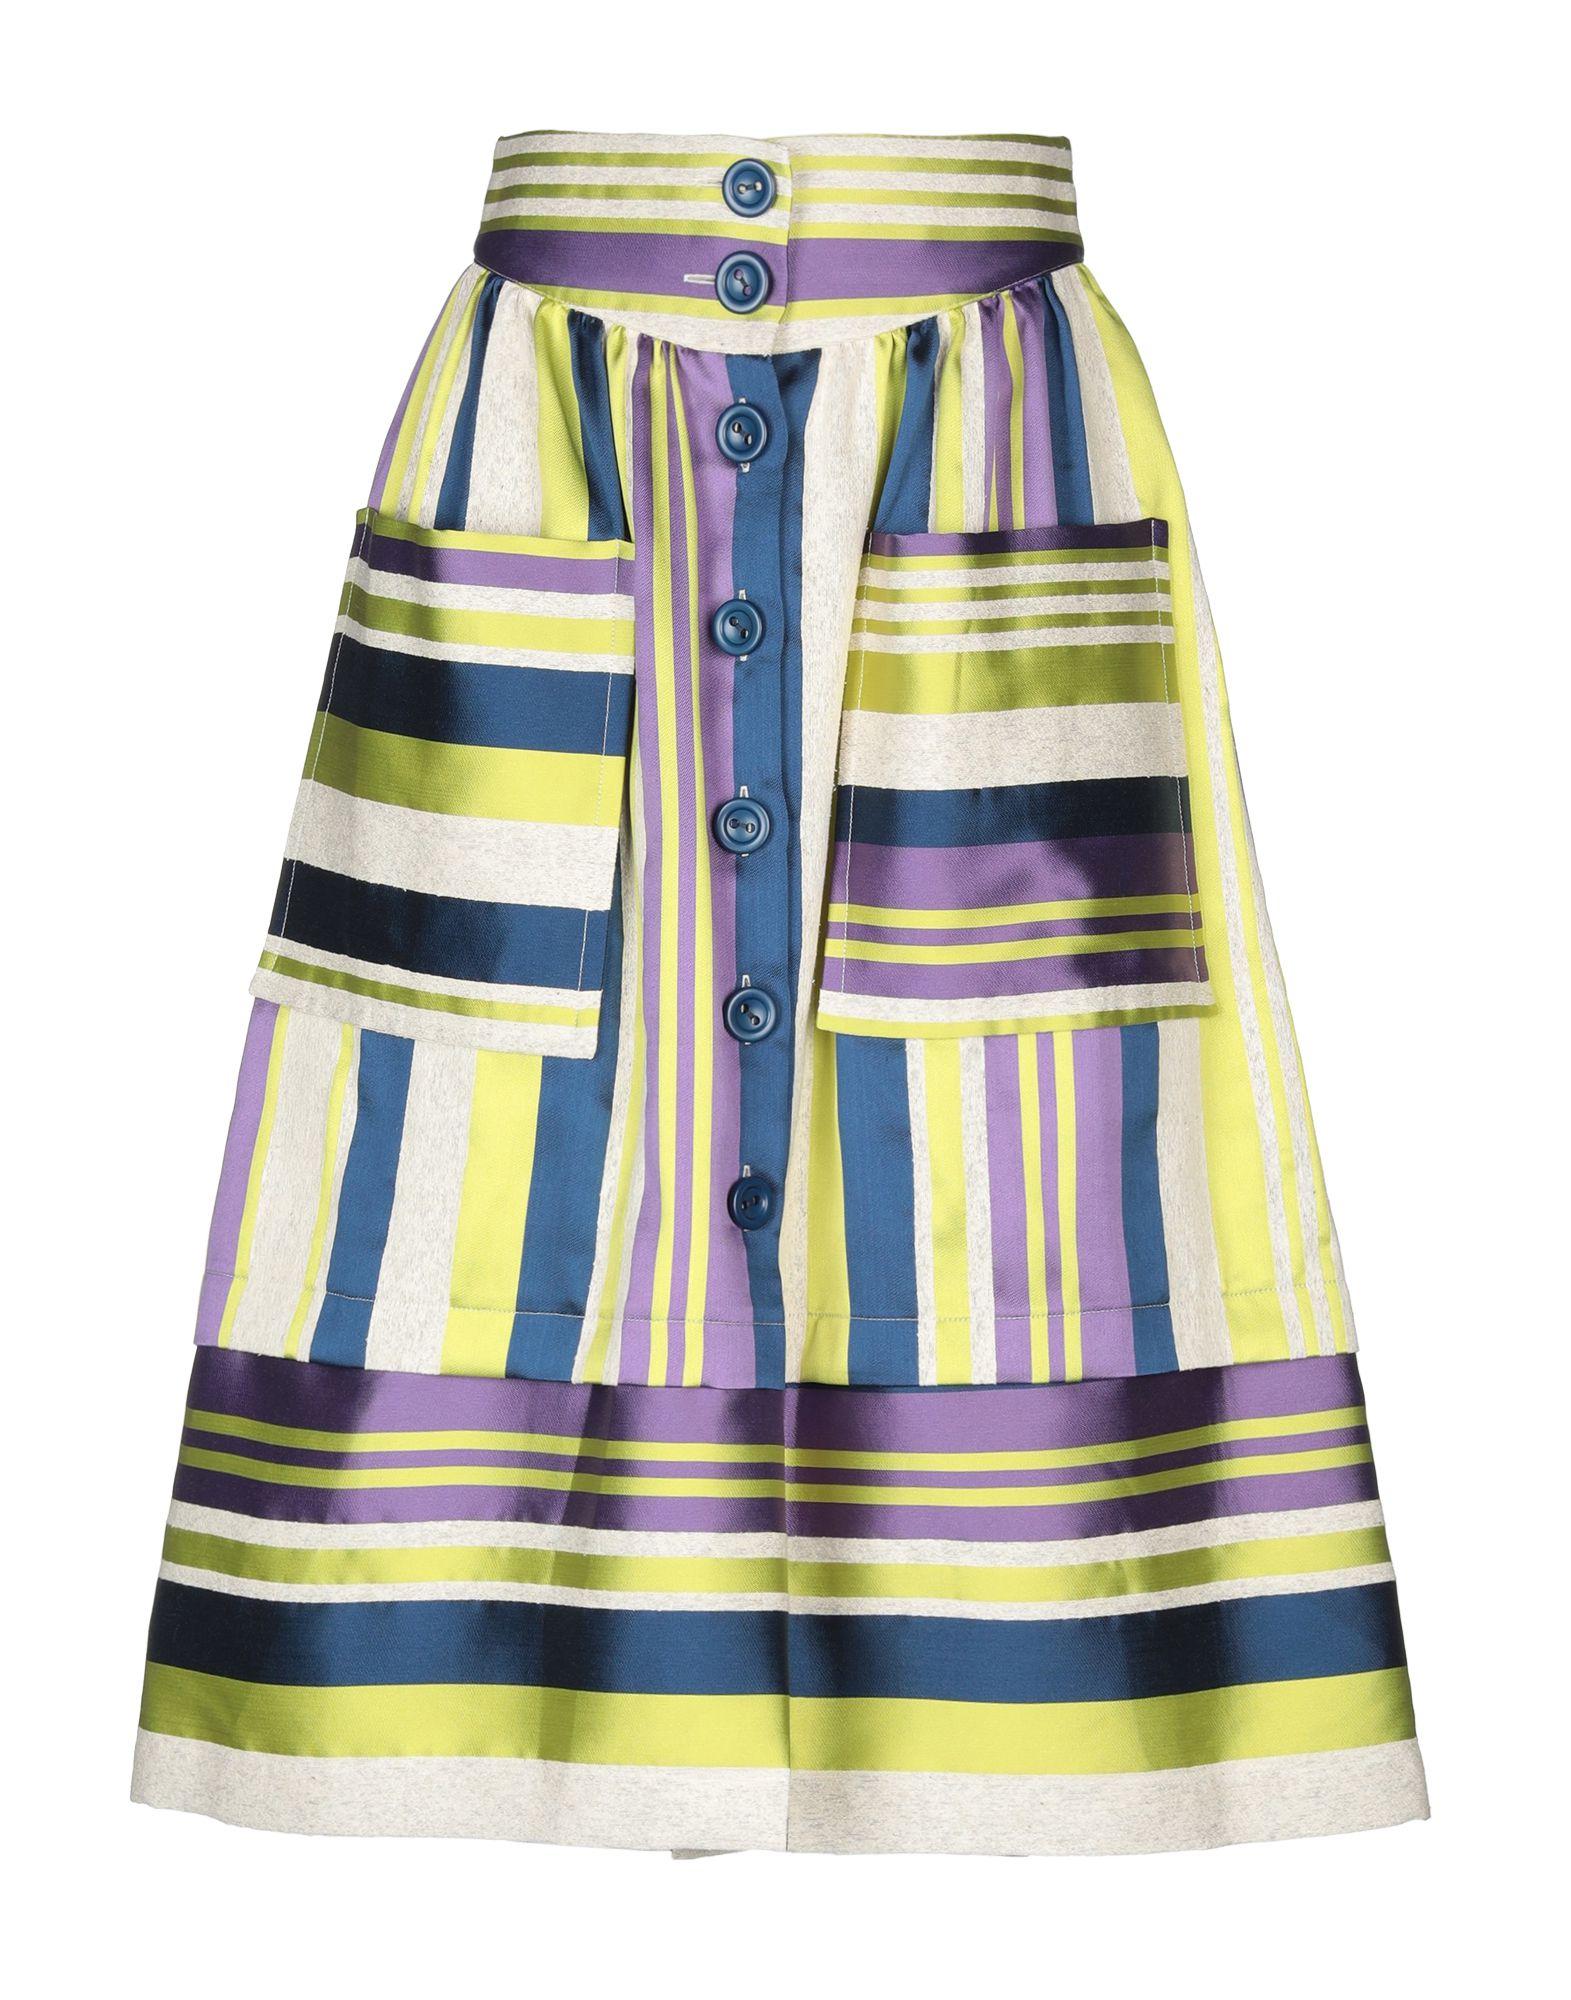 CARLOTTA CANEPA Юбка длиной 3/4 daniele carlotta юбка длиной 3 4